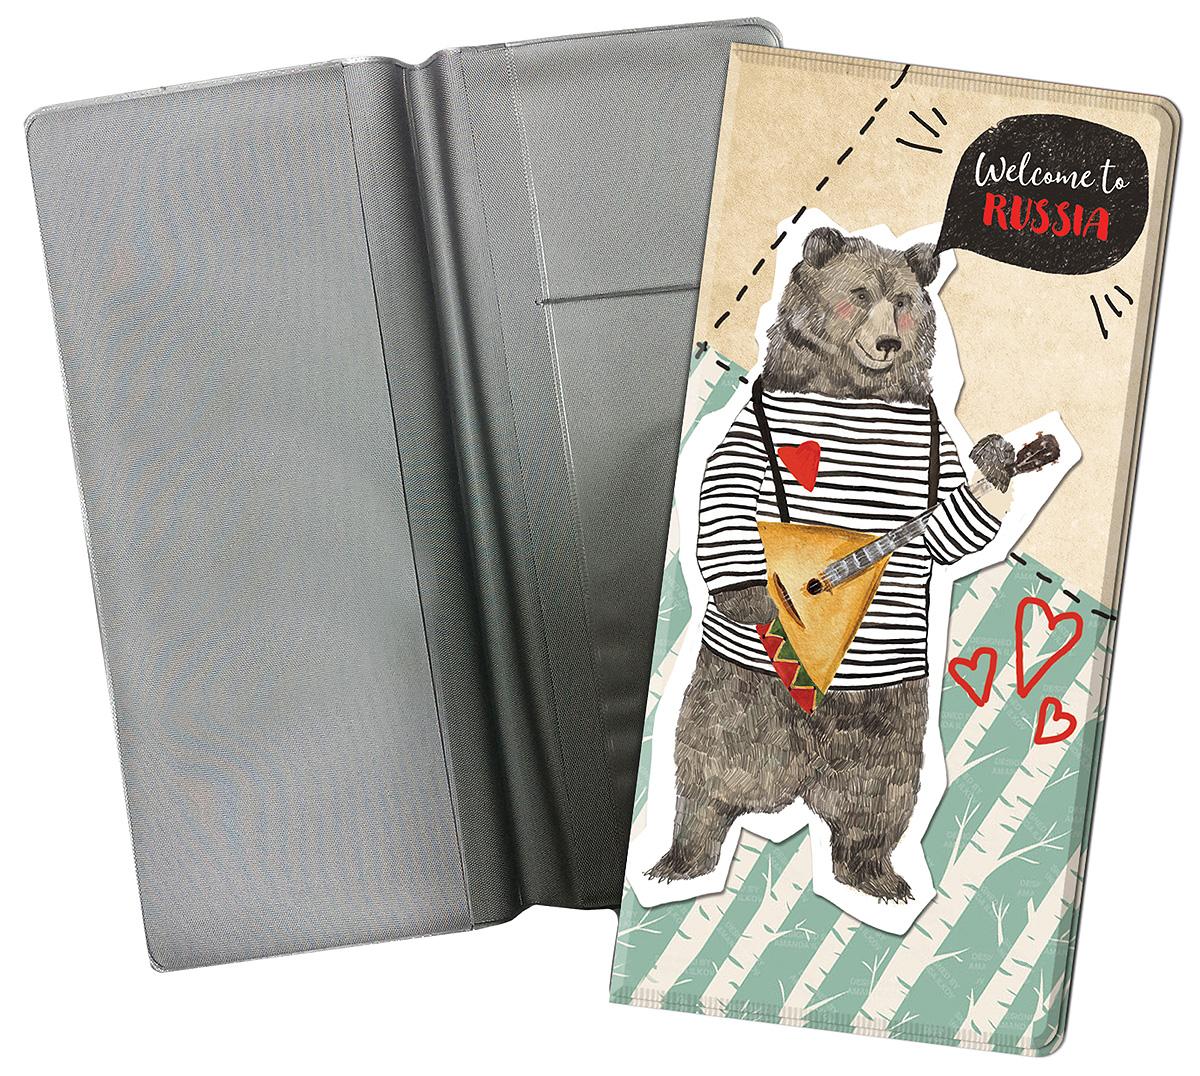 Конверт путешественника Magic Home Медведь, для документов. 77121 конверт путешественника матрешки на красном пвх 20 5 22см 77117